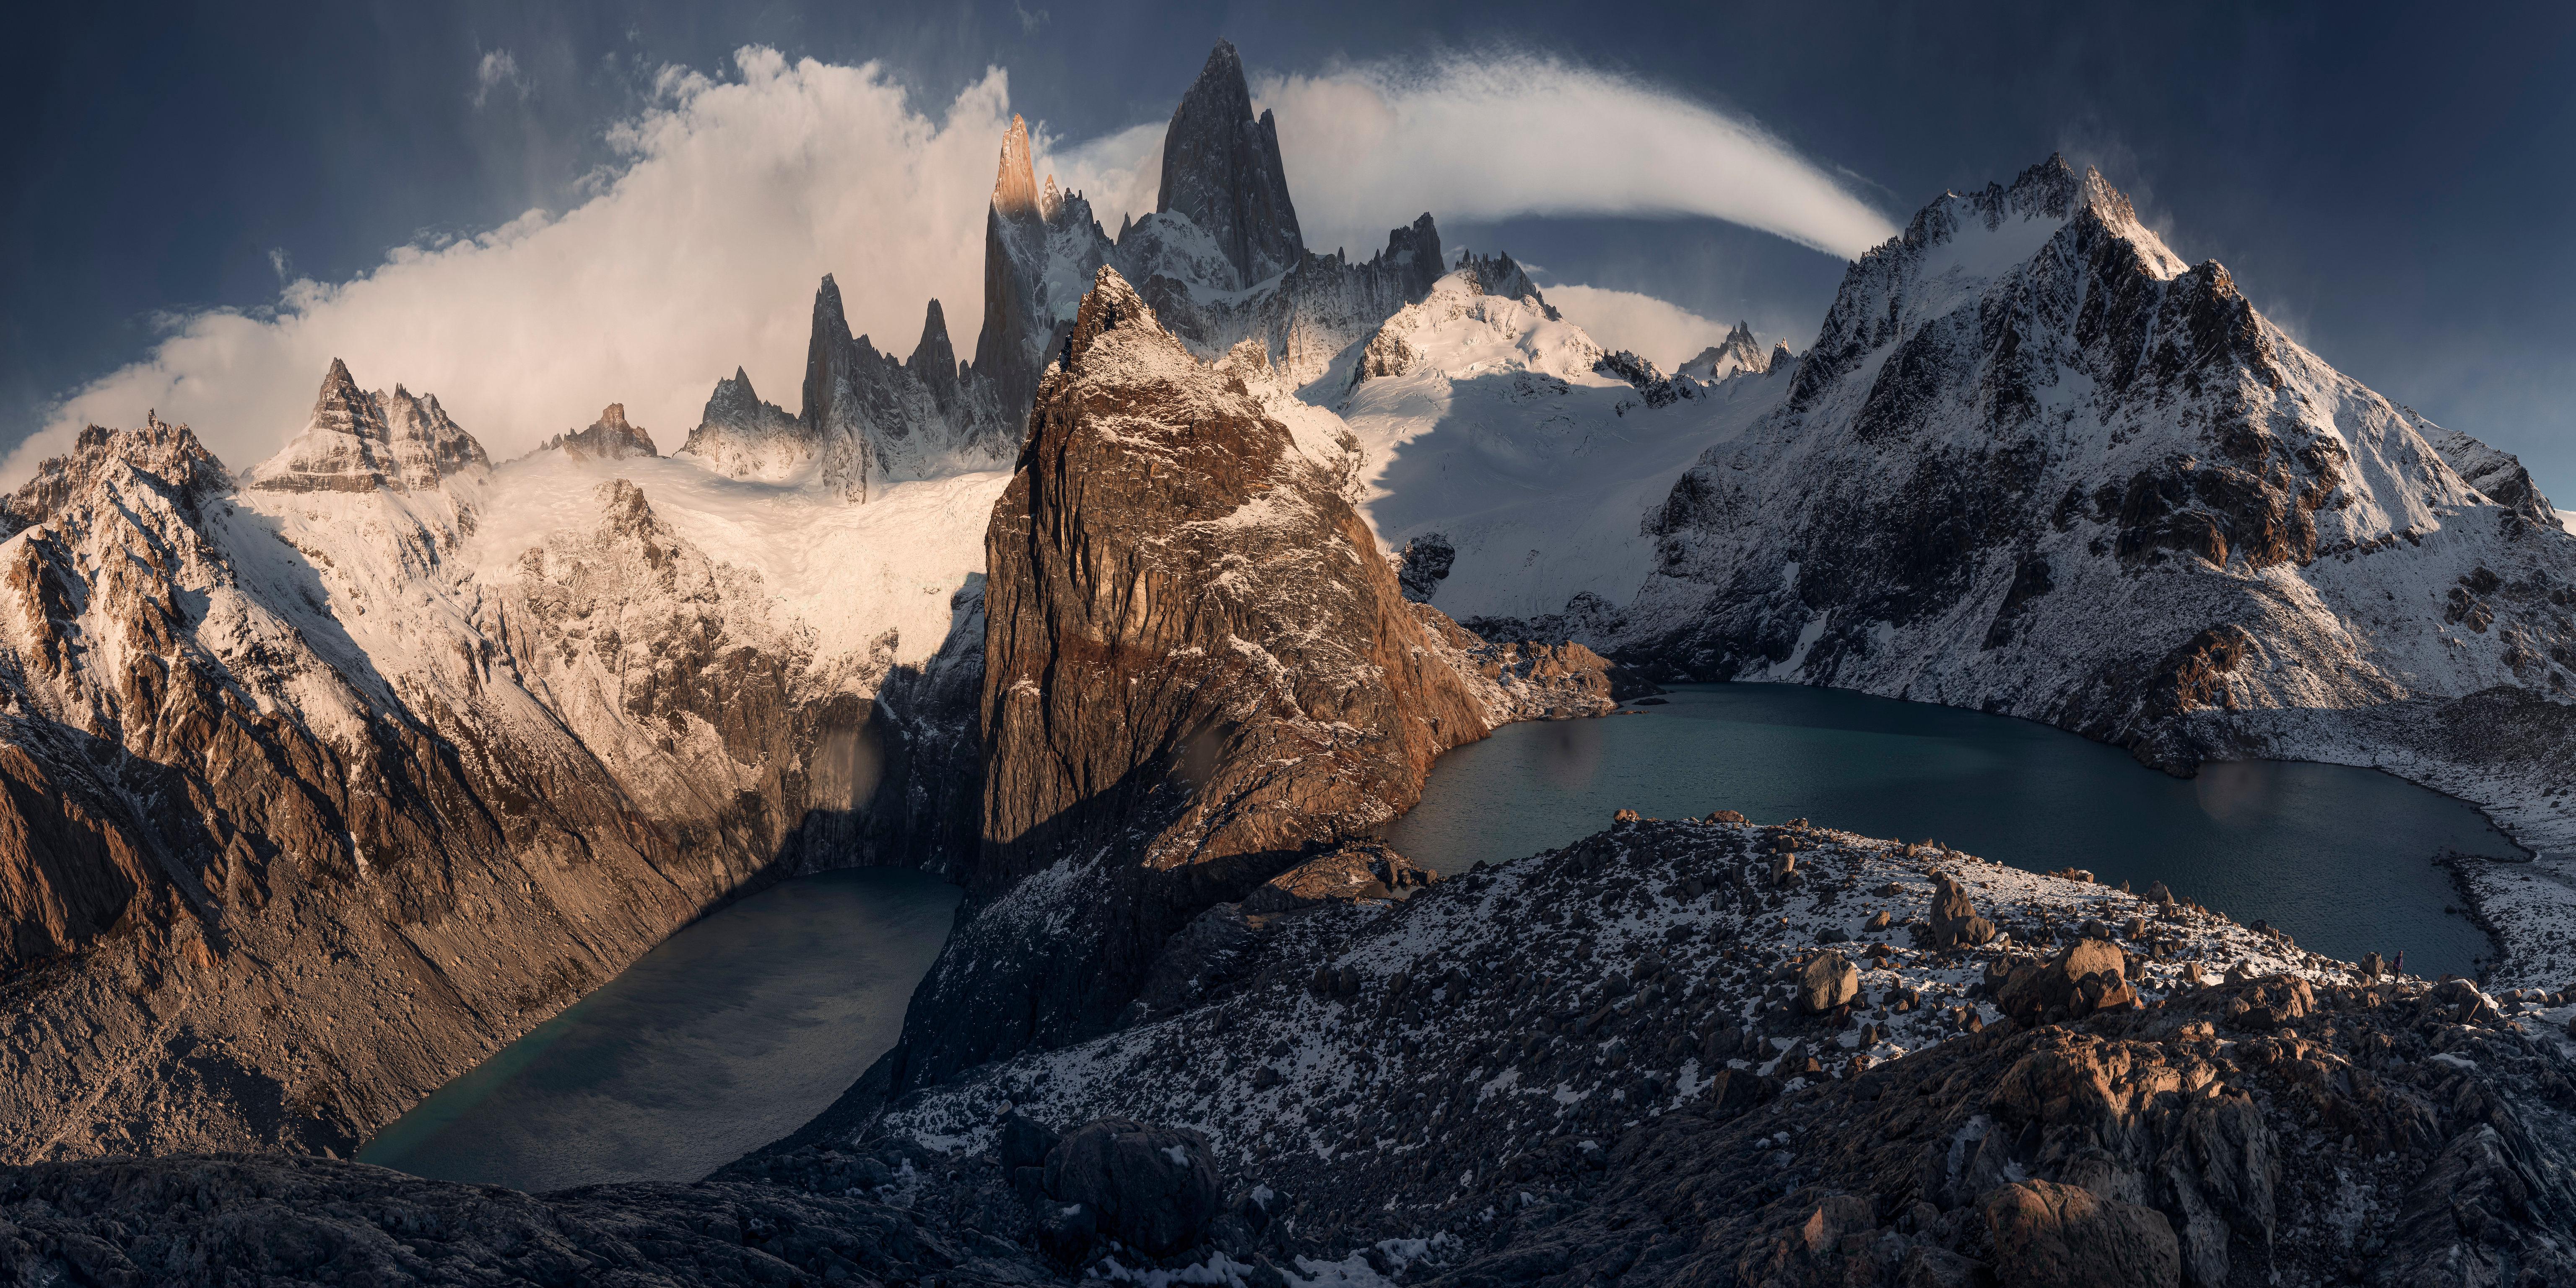 Photos Argentina Panorama Patagonia, Fitzroy Massif Crag Nature mountain Clouds panoramic Rock Cliff Mountains